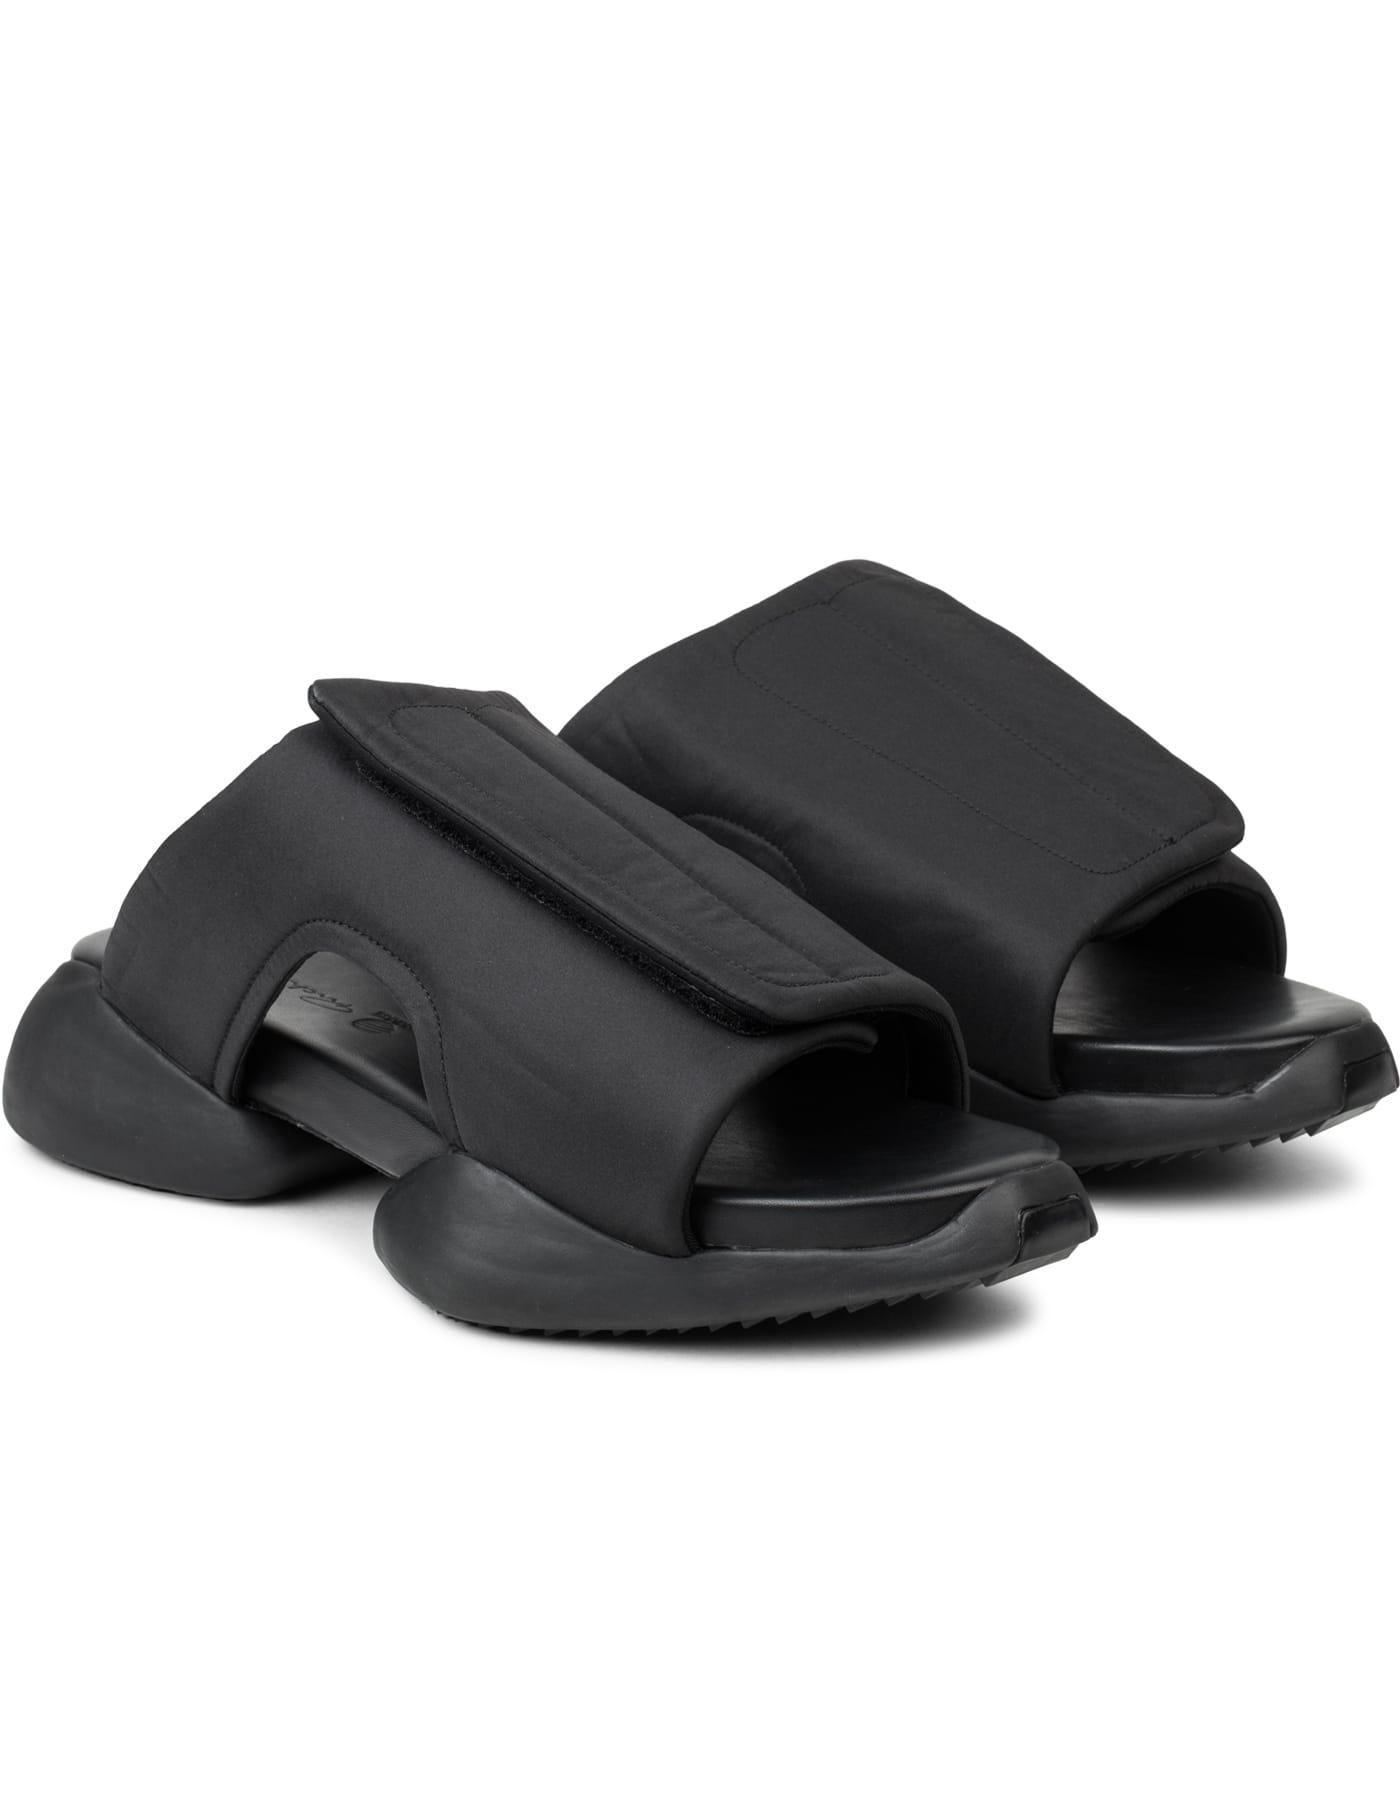 Adidas By Rick Owens Clog Sandals